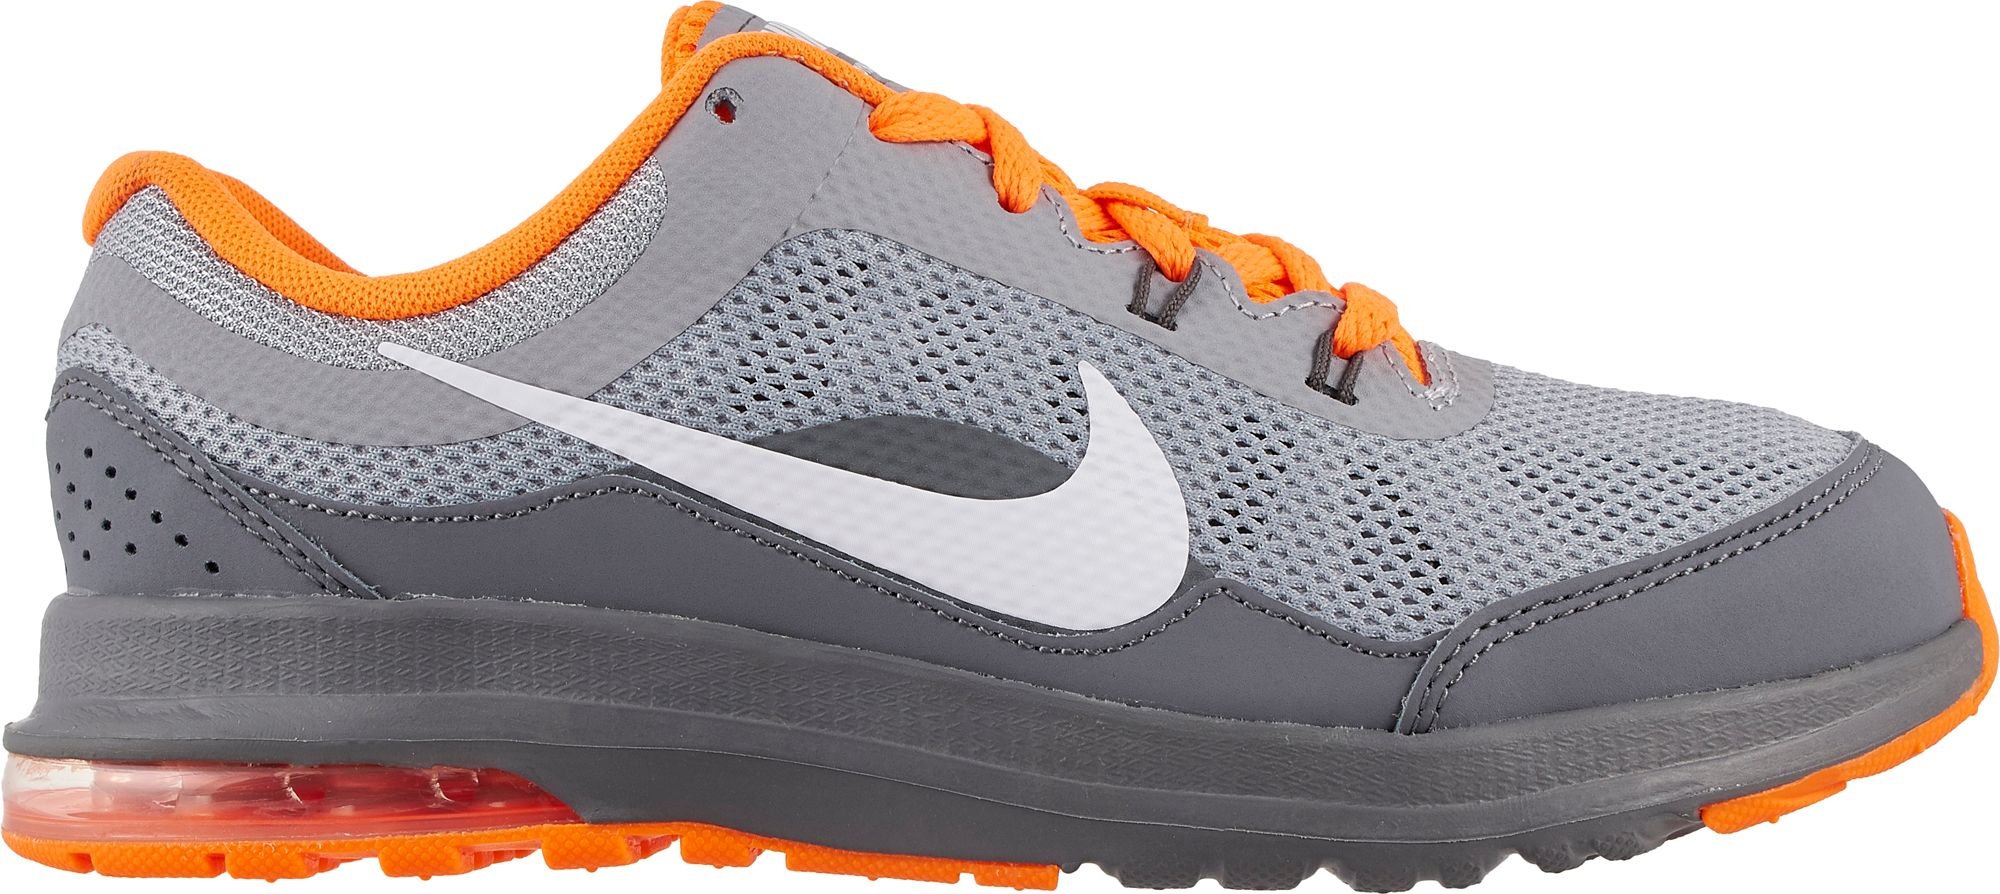 bd6ff633d22c0 85%OFF Nike Kids Preschool Air Max Dynasty 2 Running Shoes DICKS Sporting  Goods